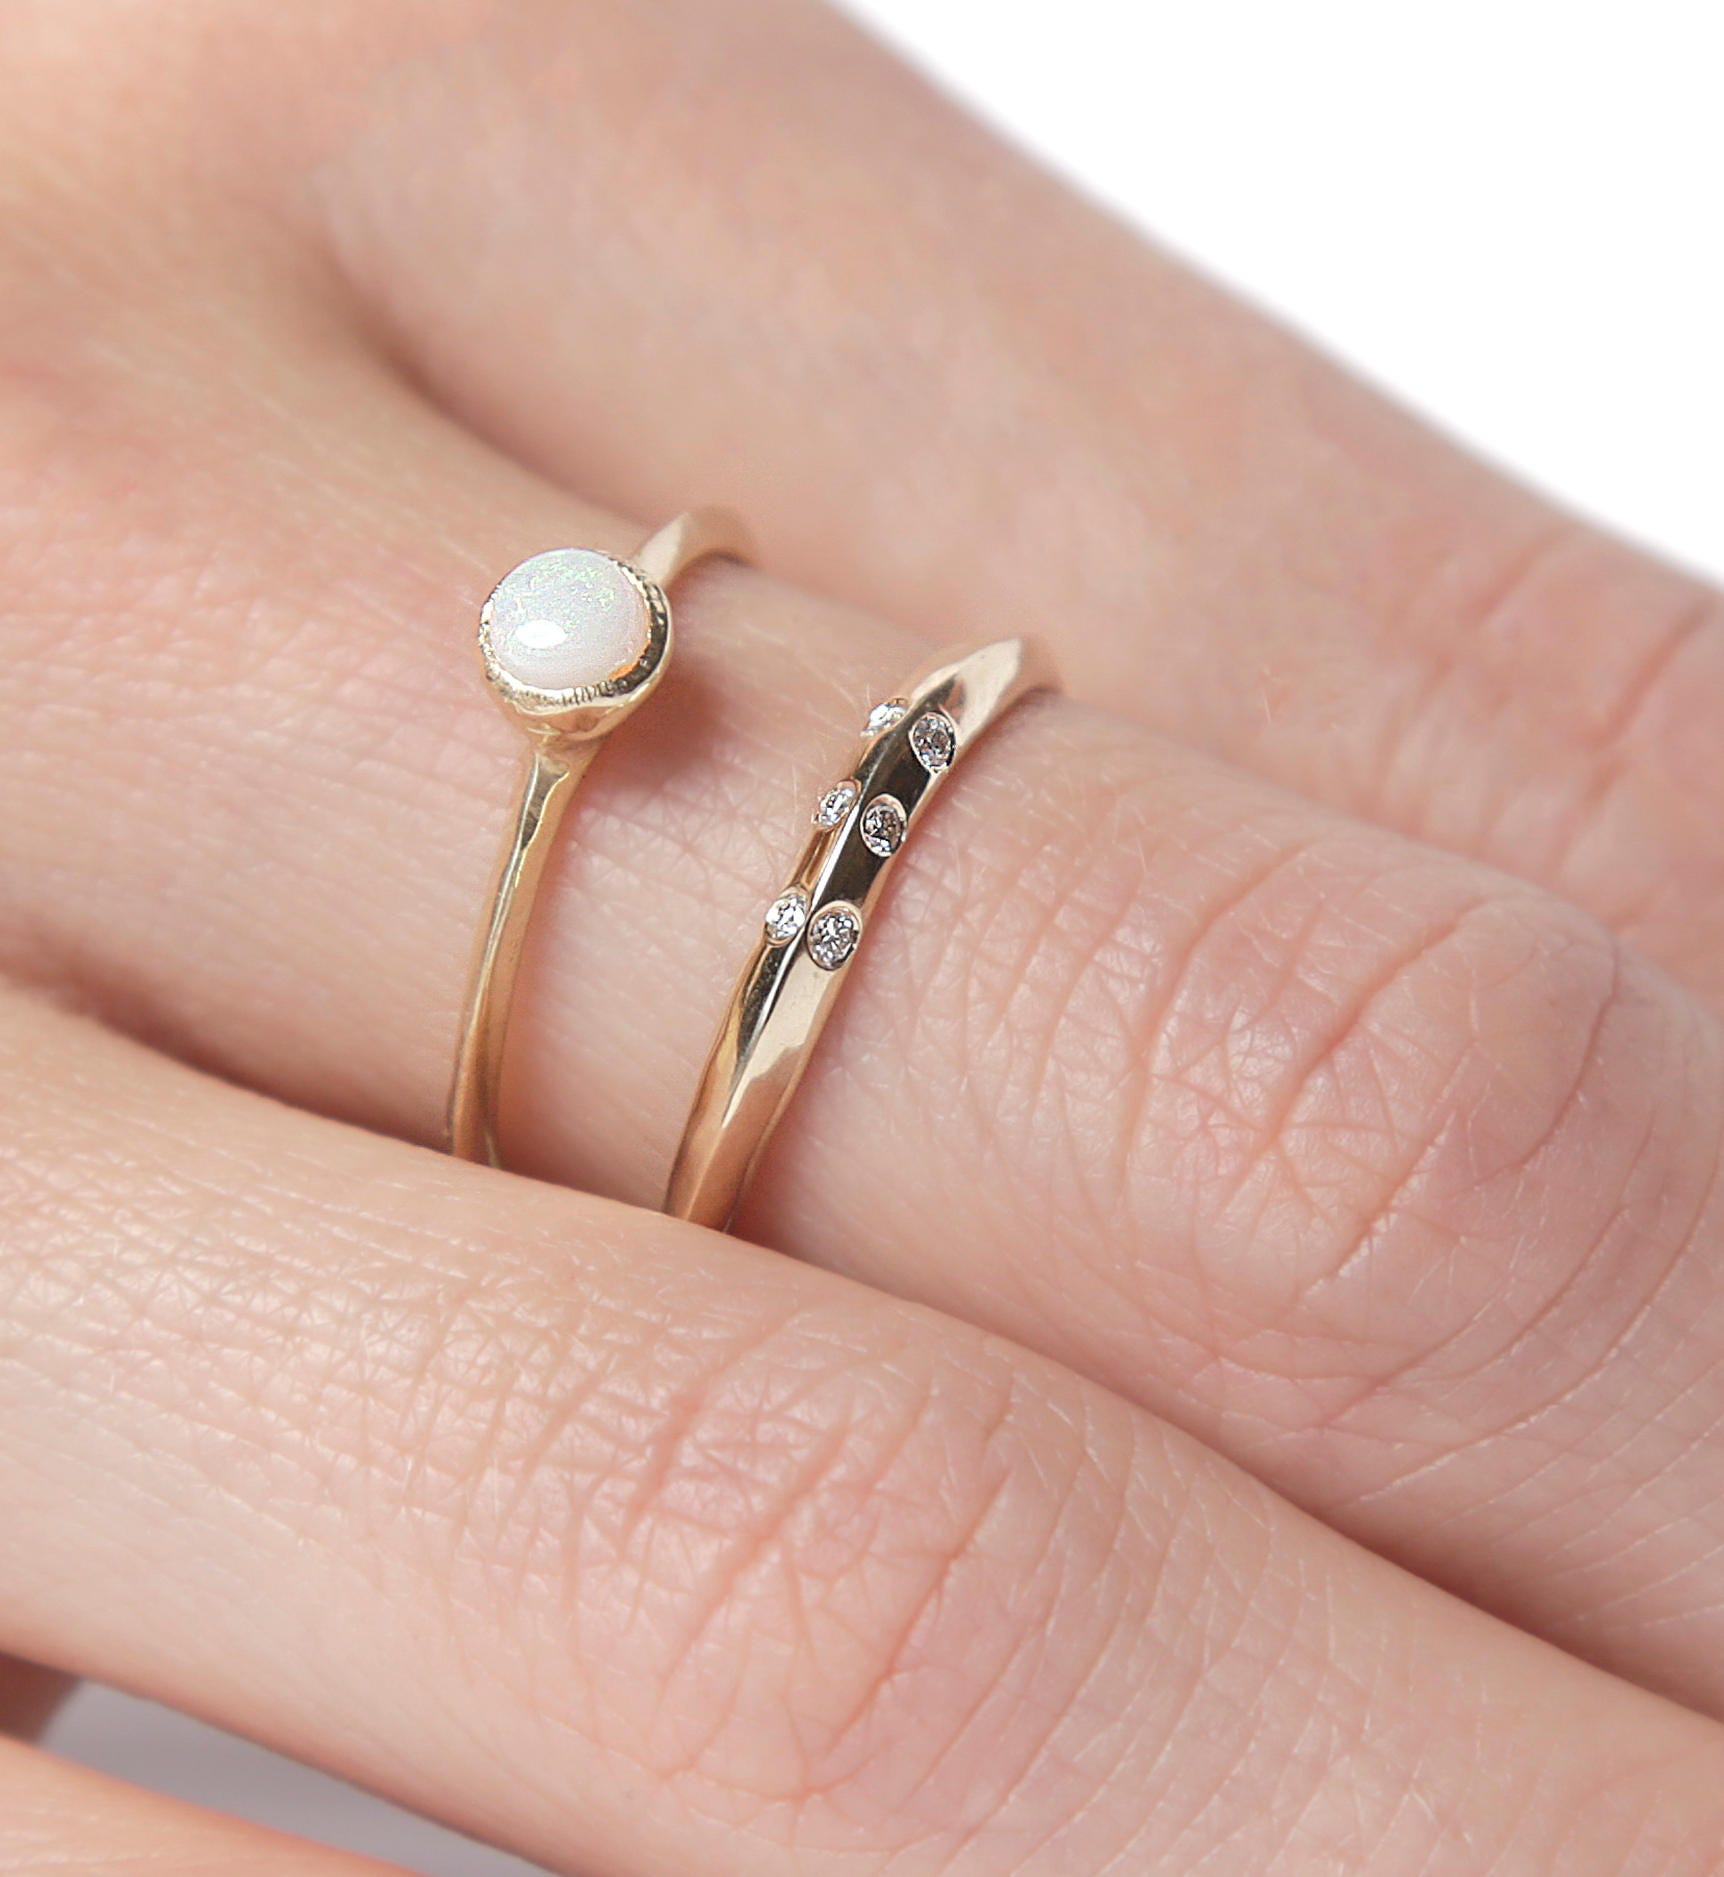 14k Opal and Shimmering Diamond Ring Set 14k Gold Ring Set